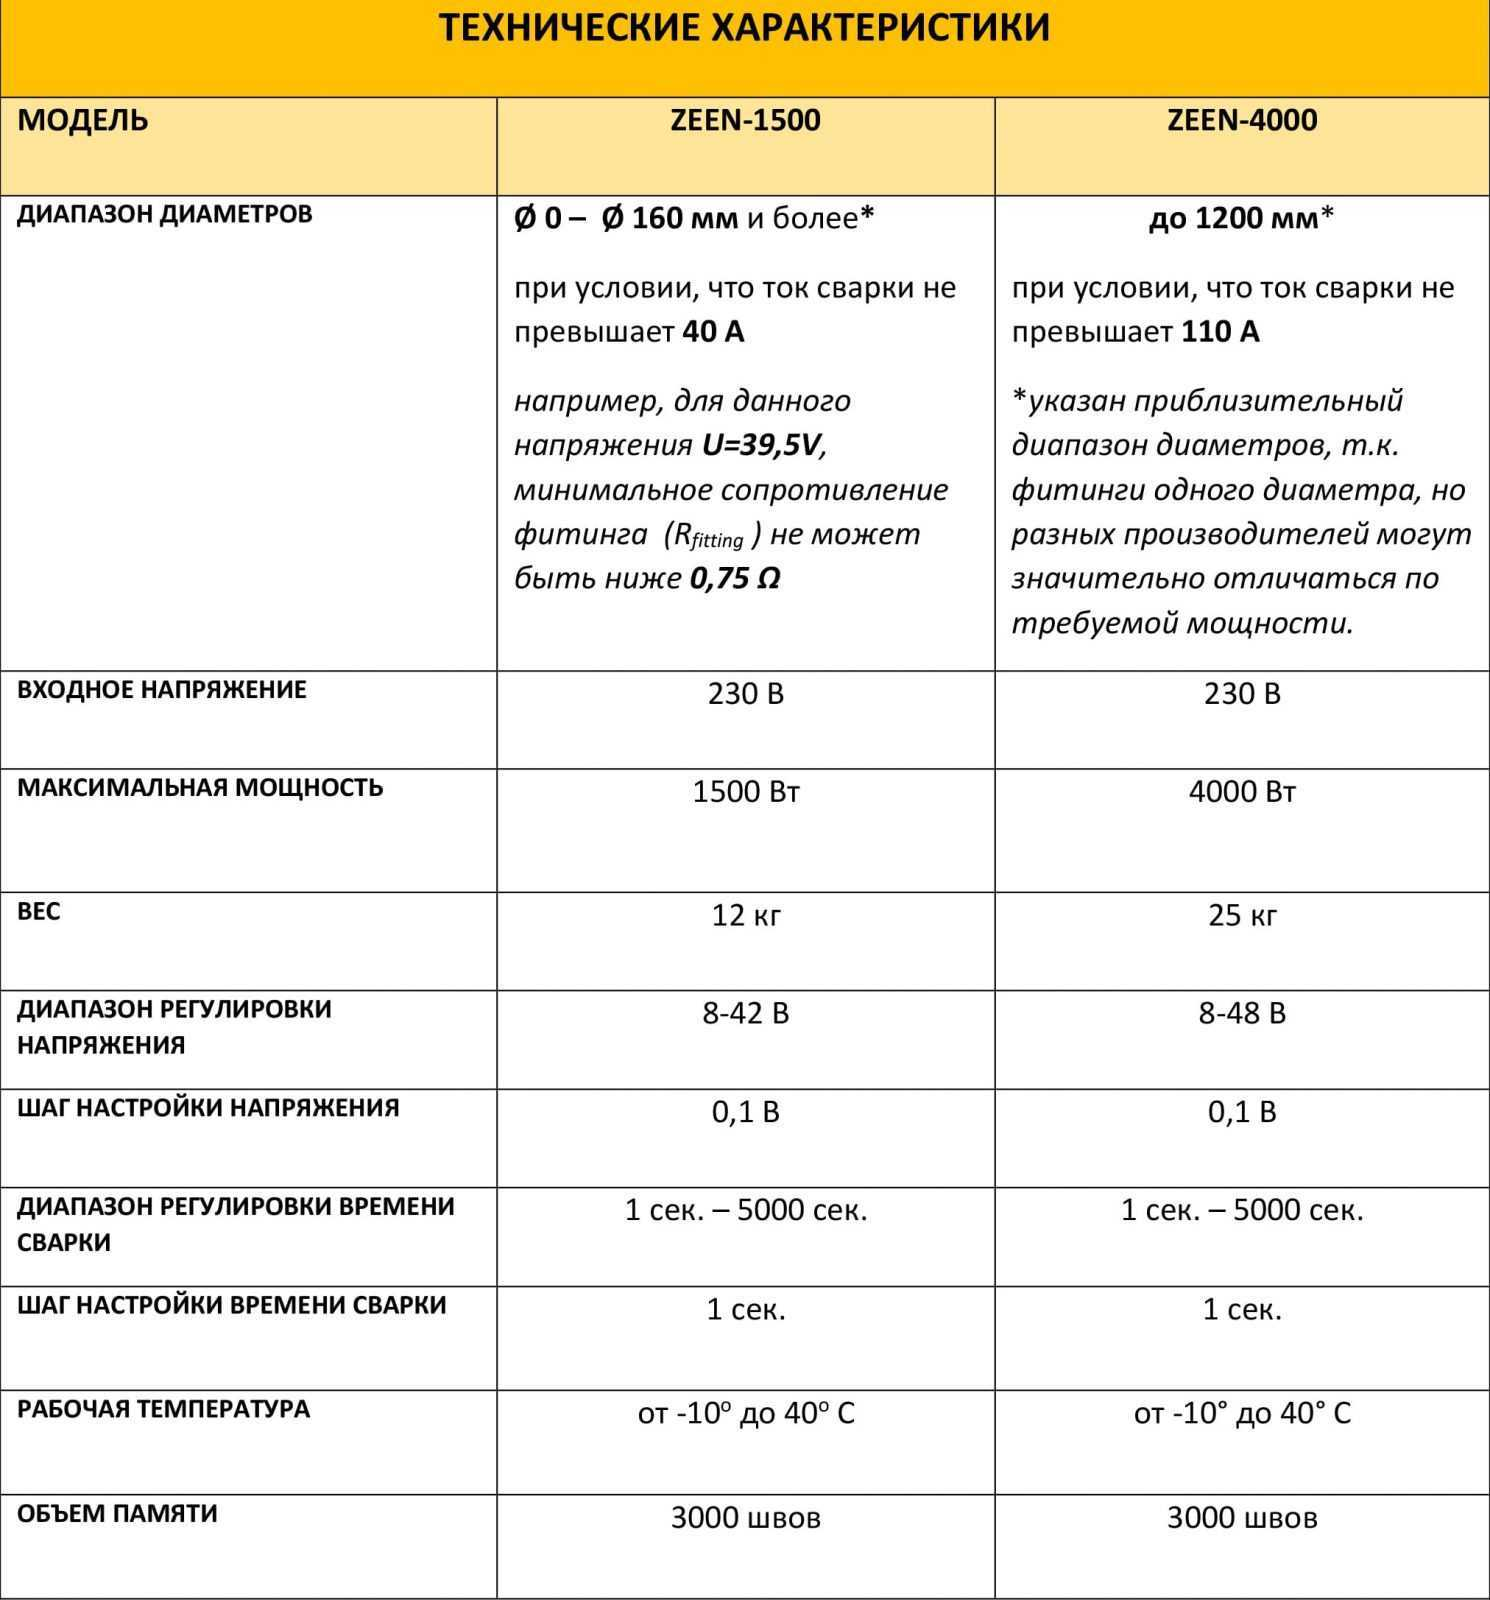 Теx_характ ZERN-1500/4000